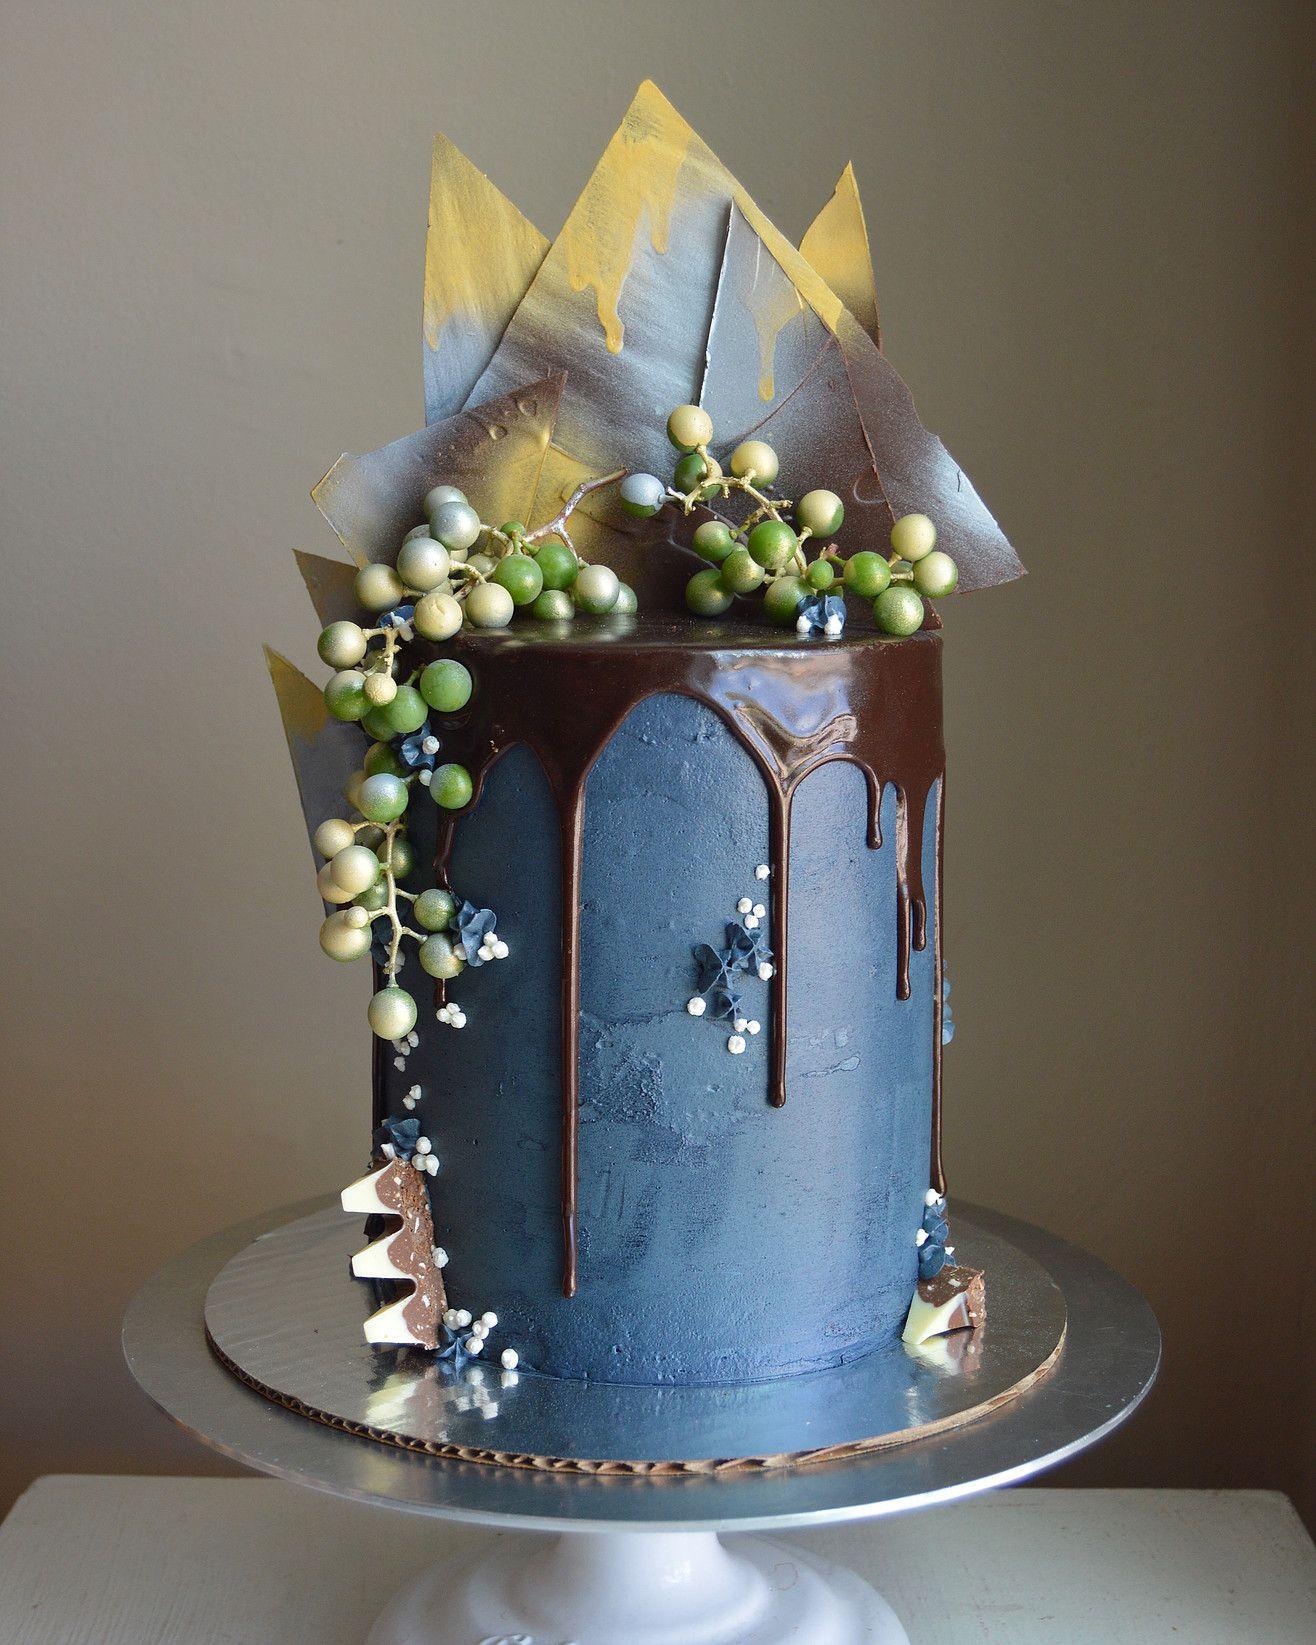 Bon vivant cakes chicago custom cakes cake chicago